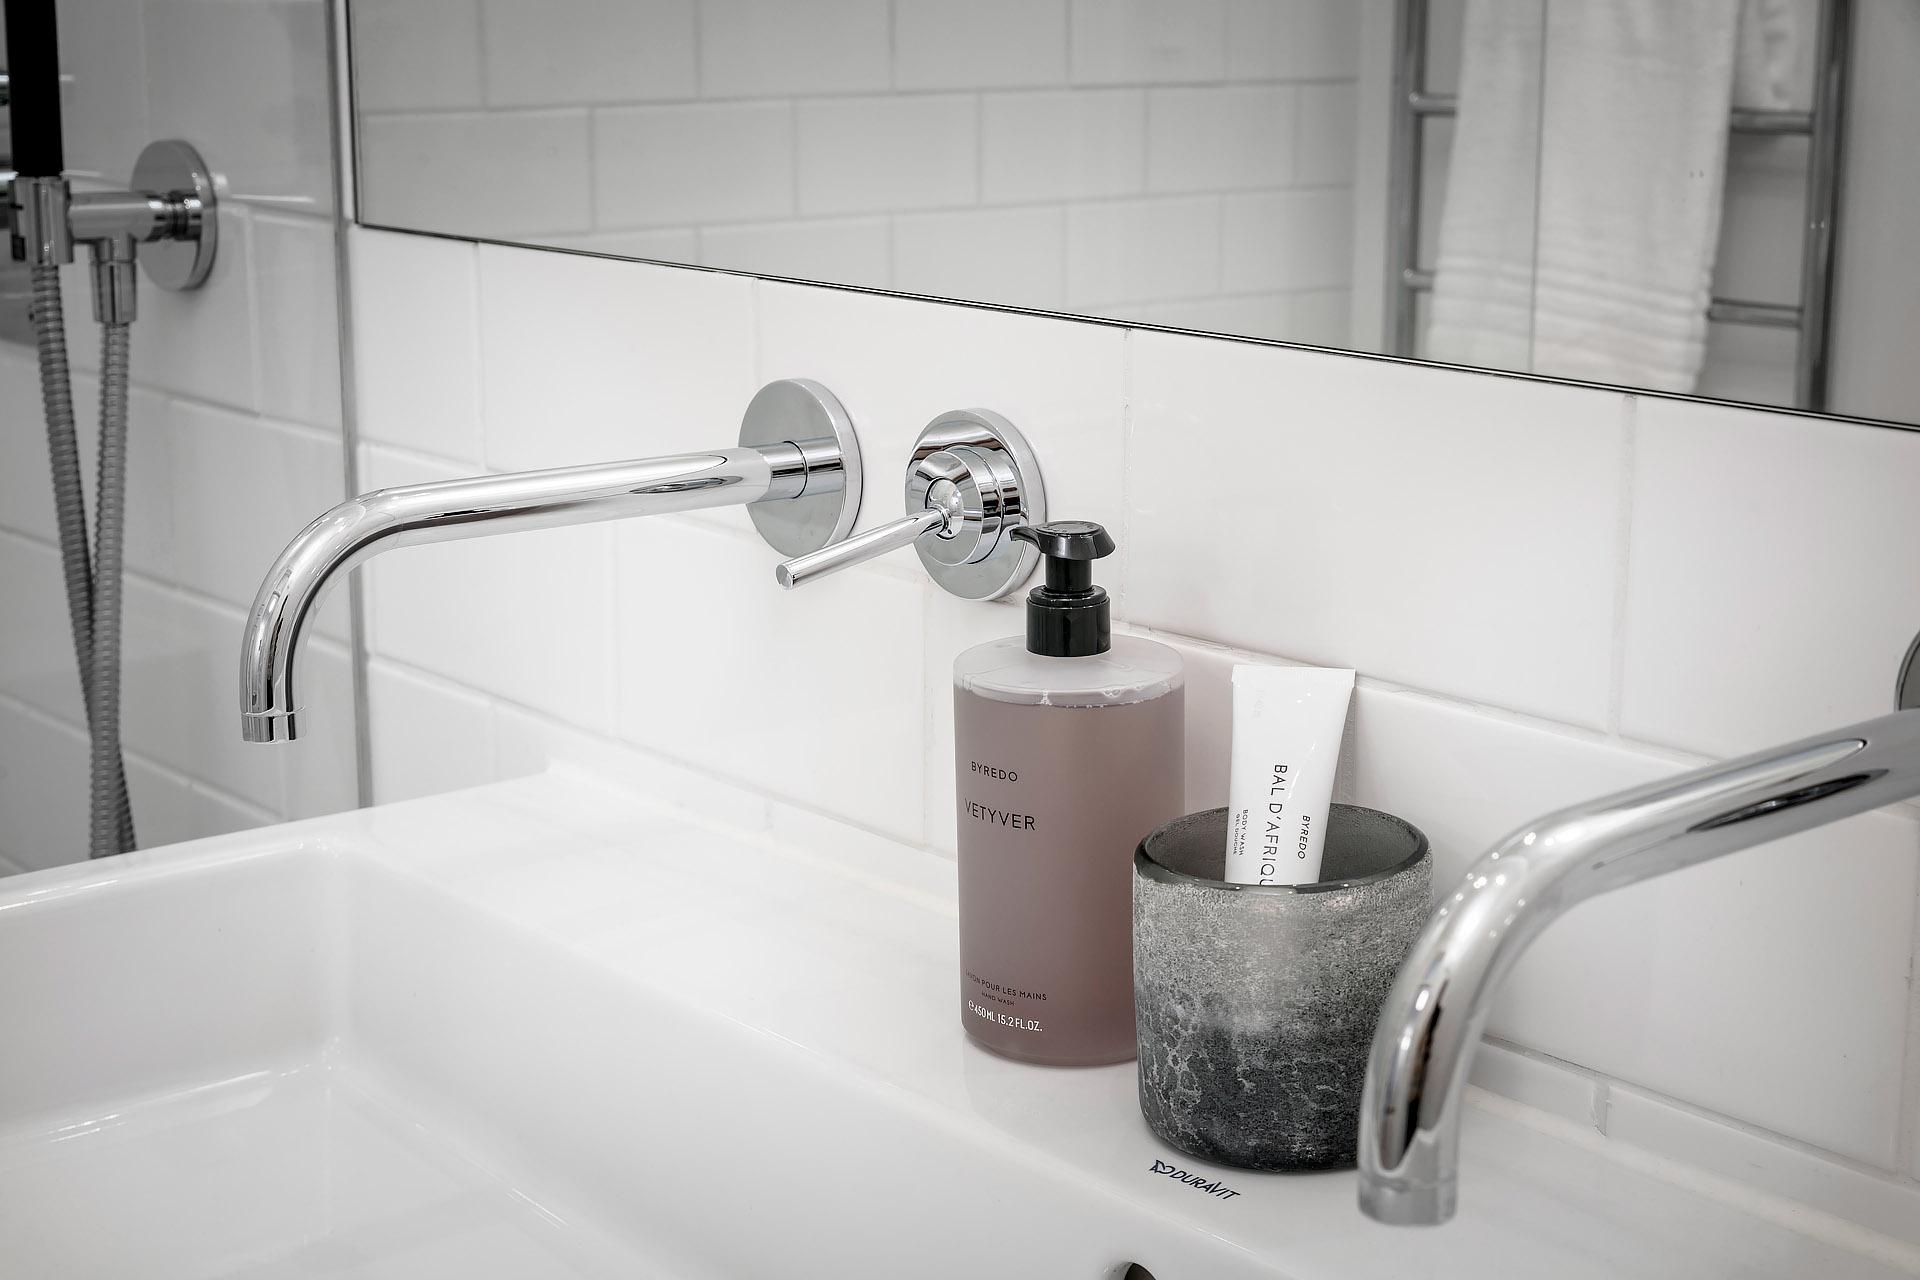 Witte Badkamer Wastafel : Wastafels wash me van clou brede maten hippe kleuren